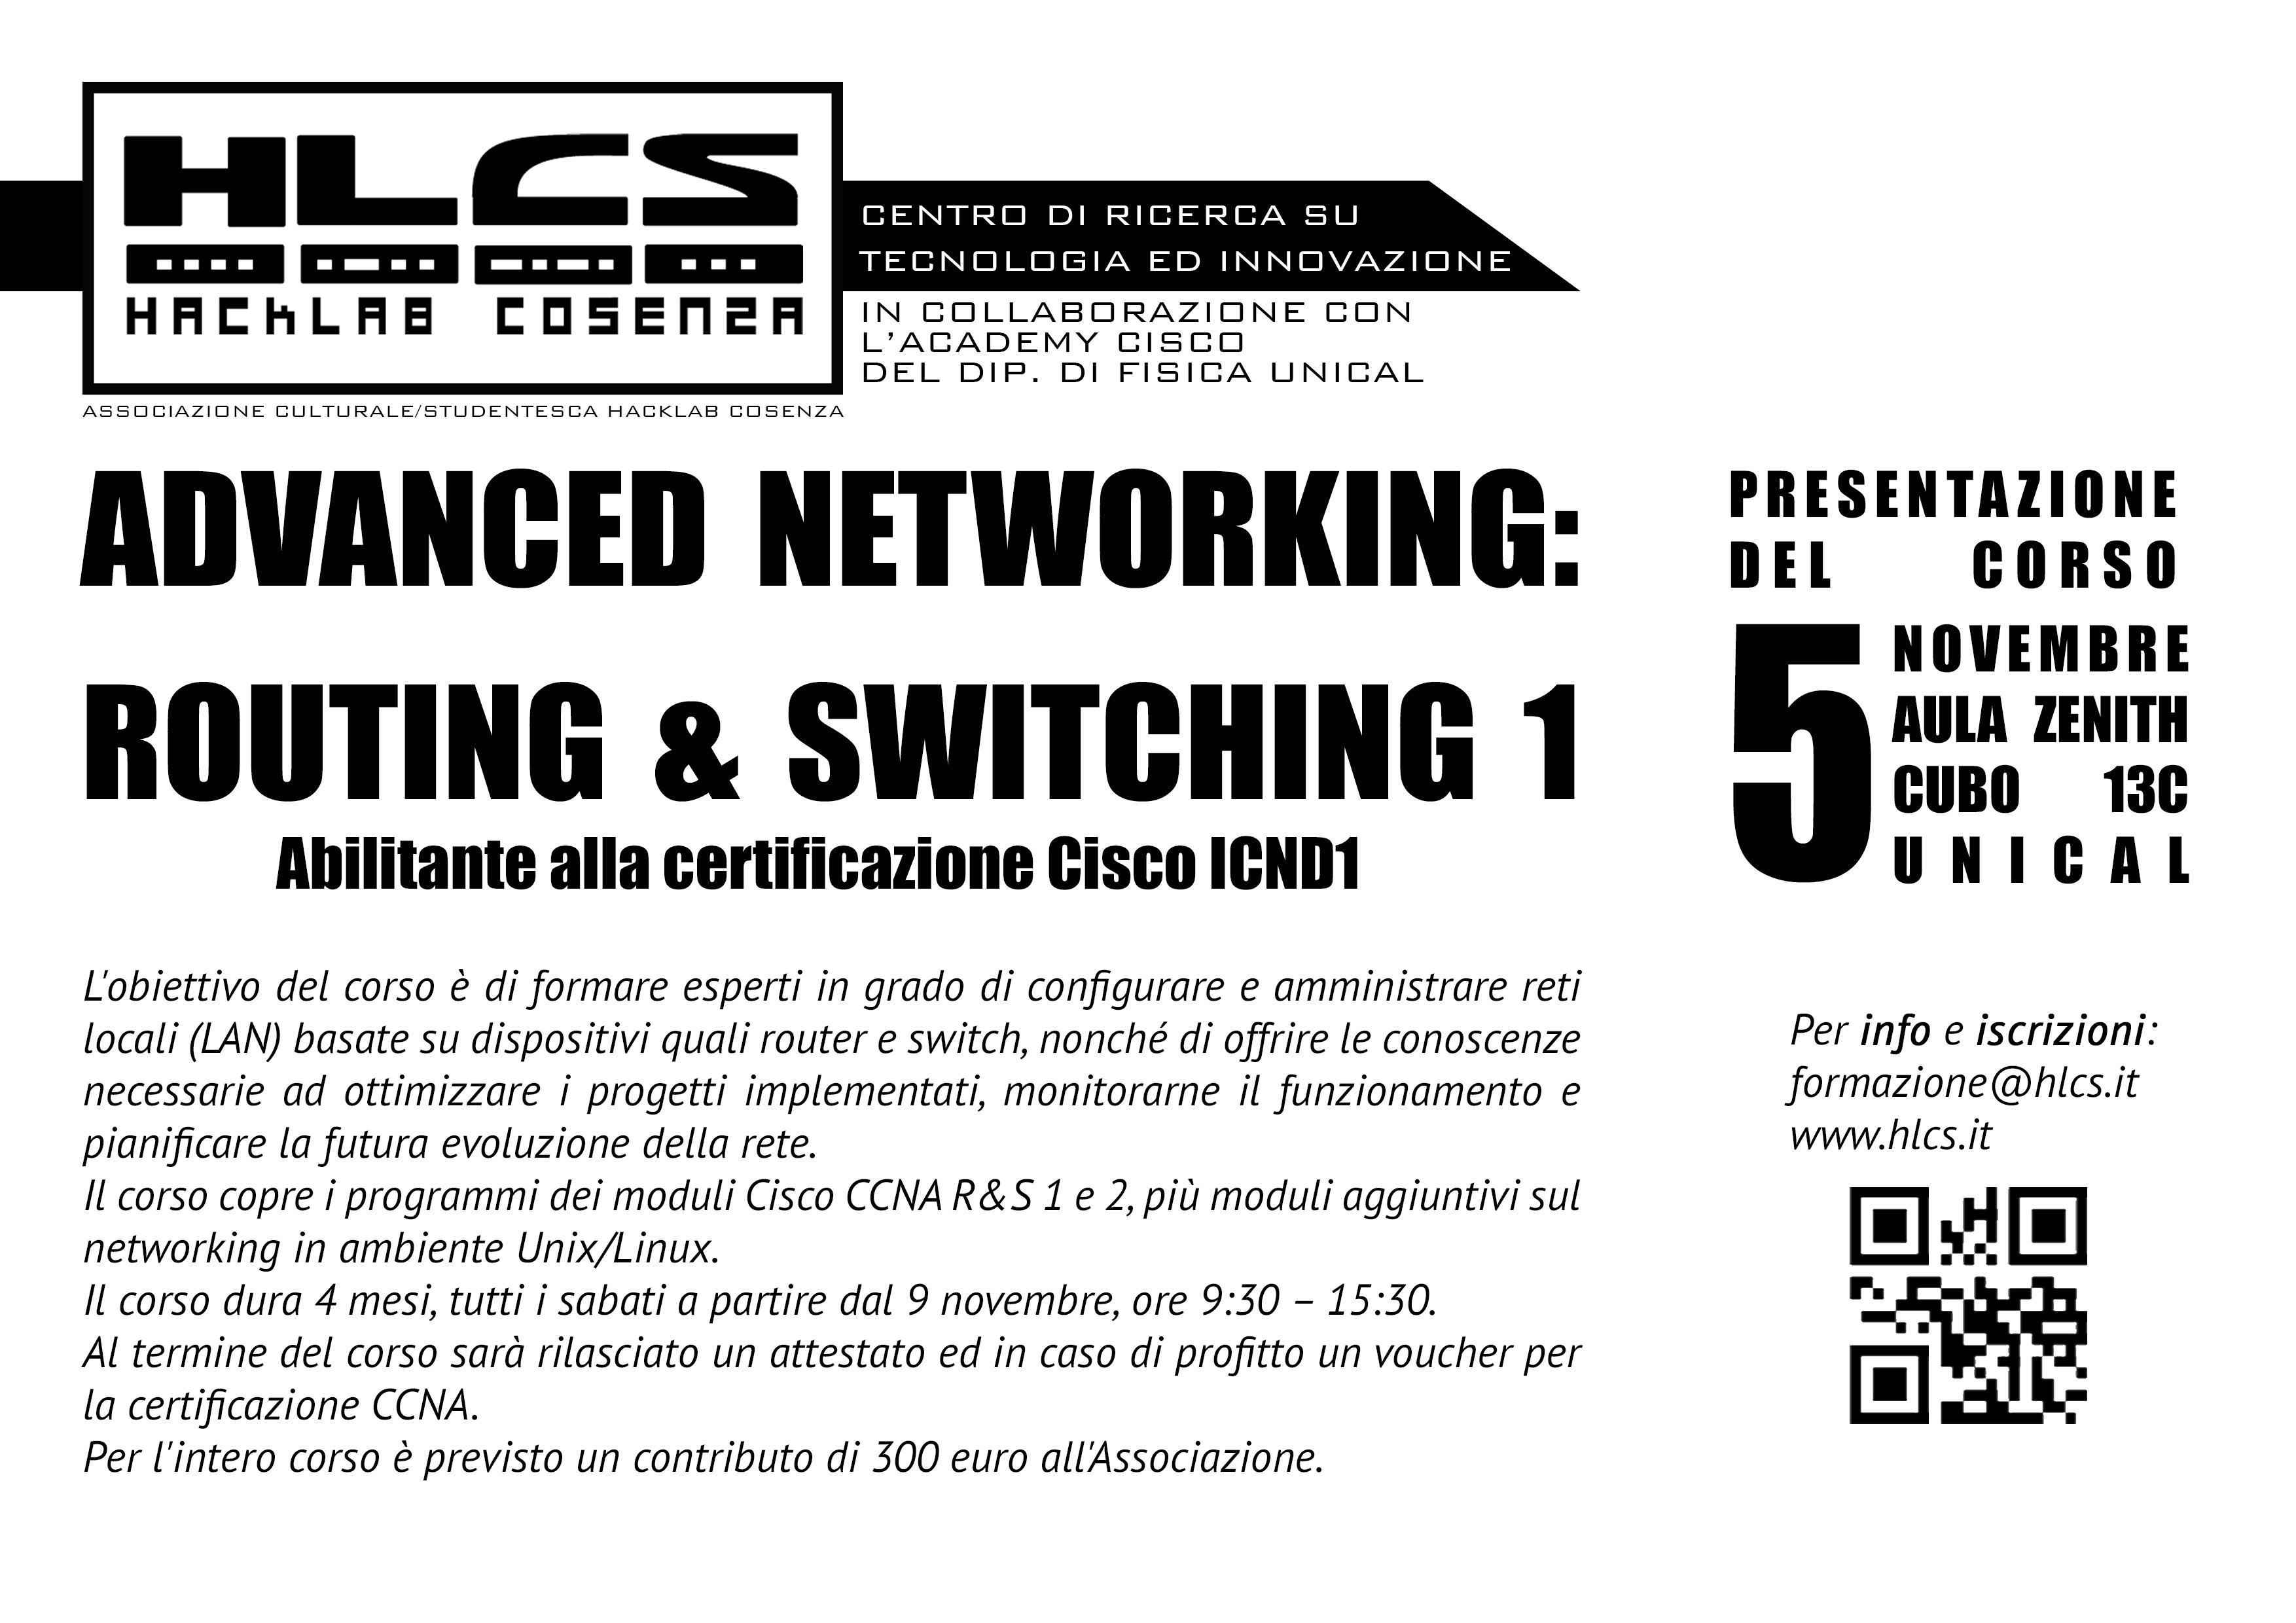 faq sul corso cisco advanced networking routing switching  corso networking 1 2013 2014